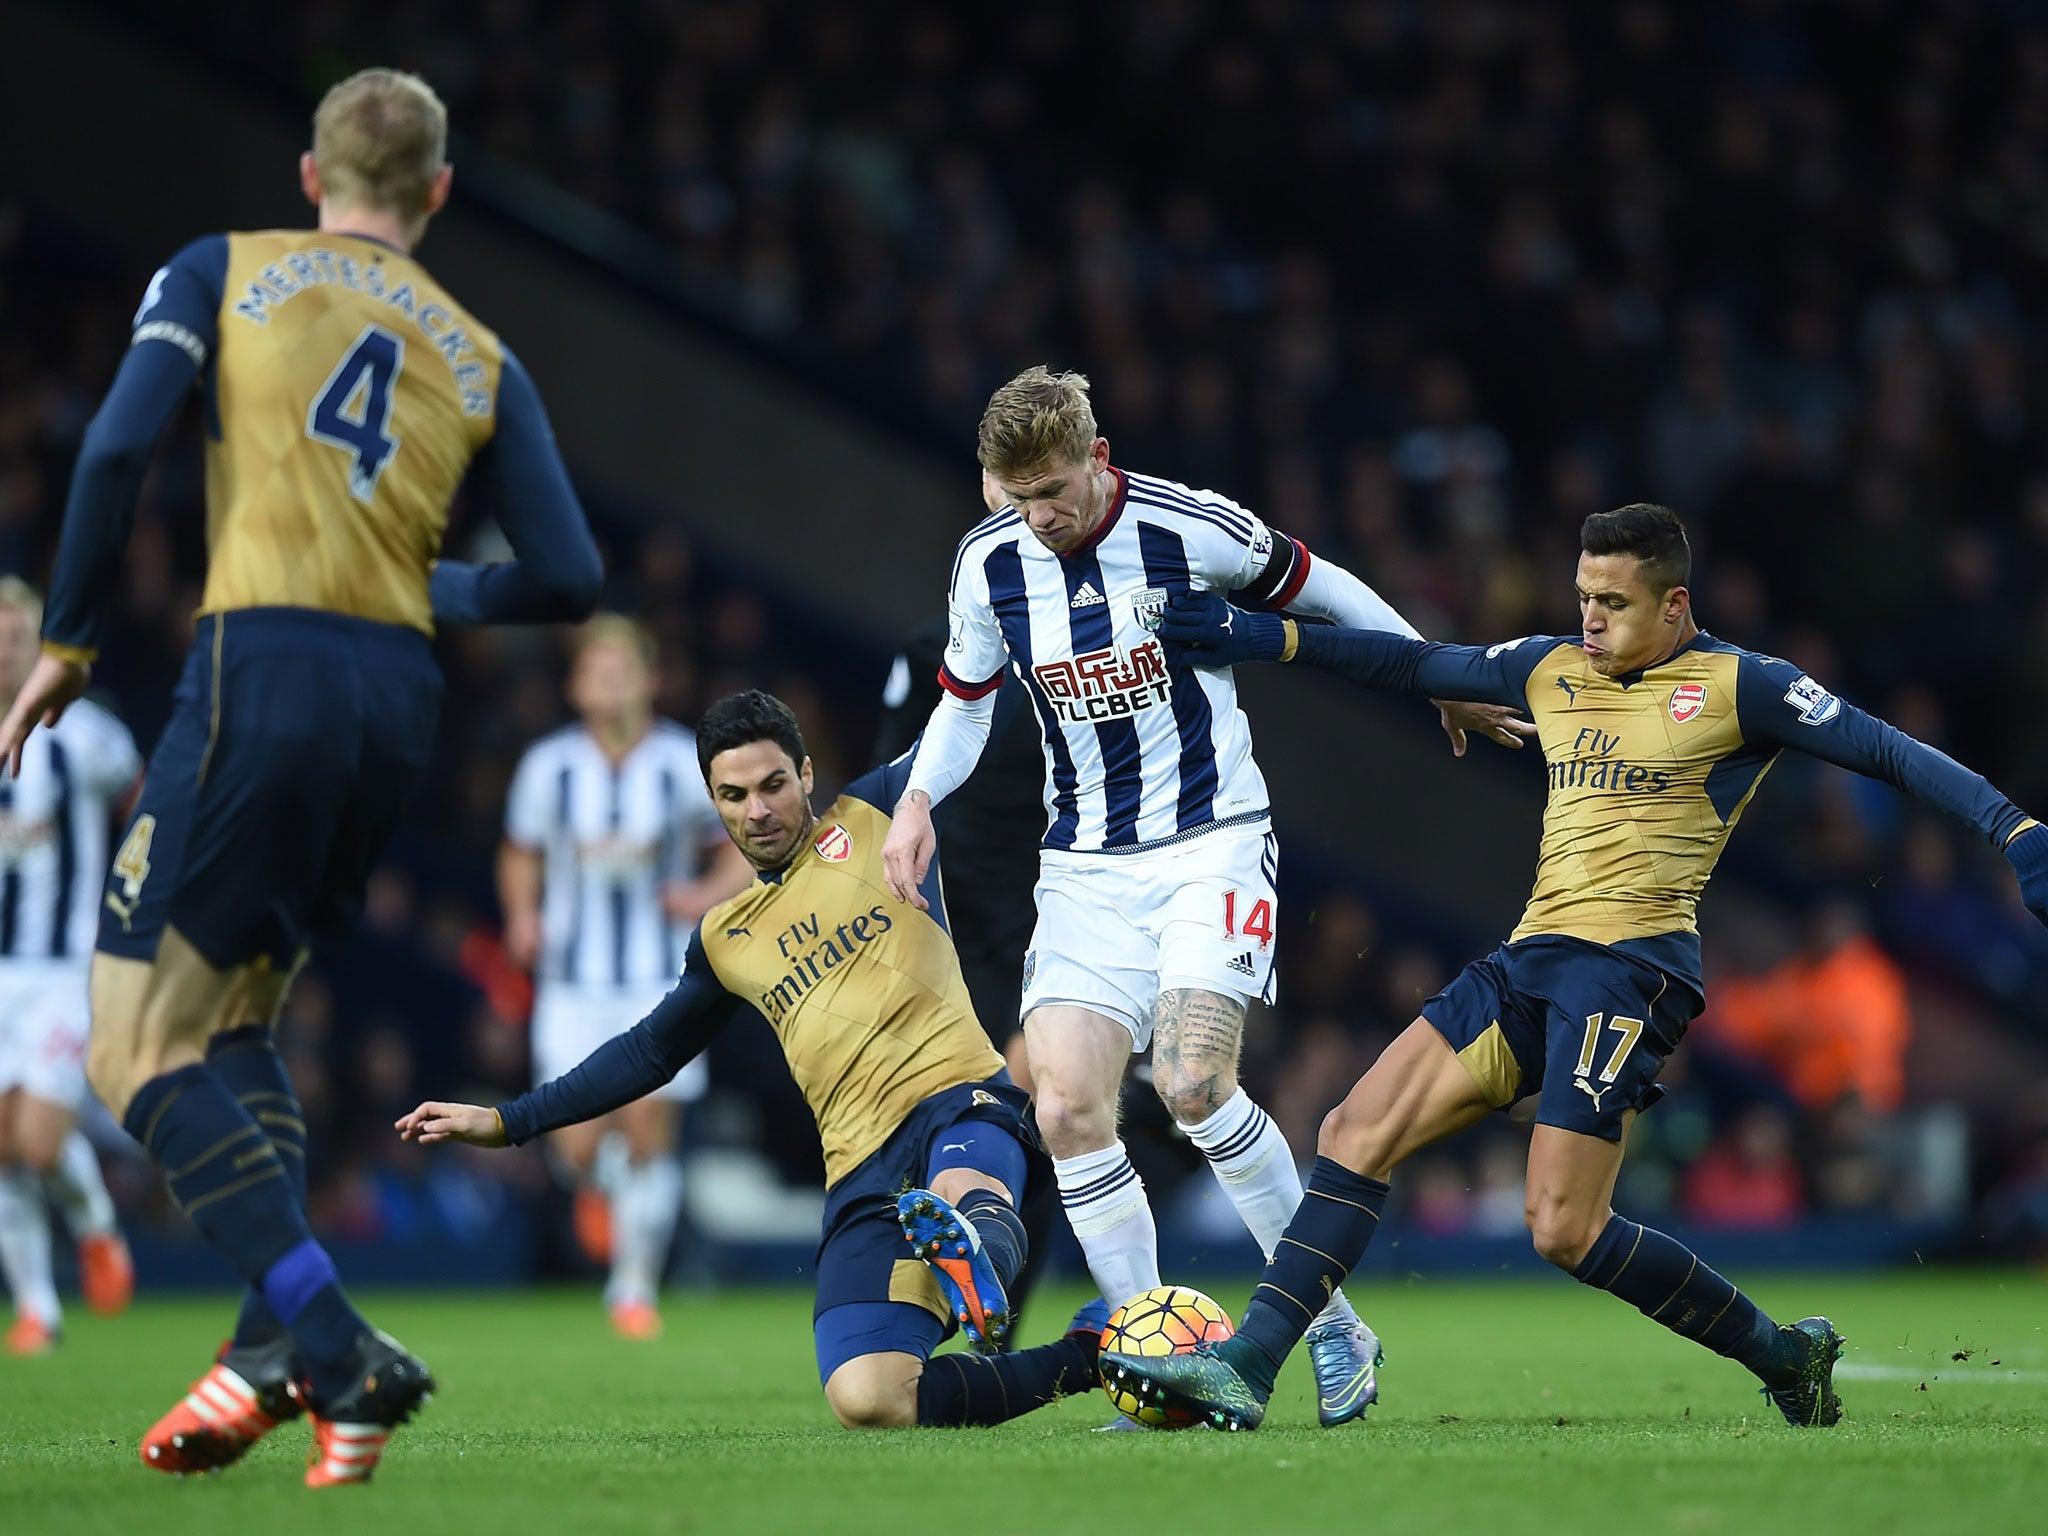 West Brom vs Arsenal player ratings: Mikel Arteta endures a horror show as James McClean stars for Baggies